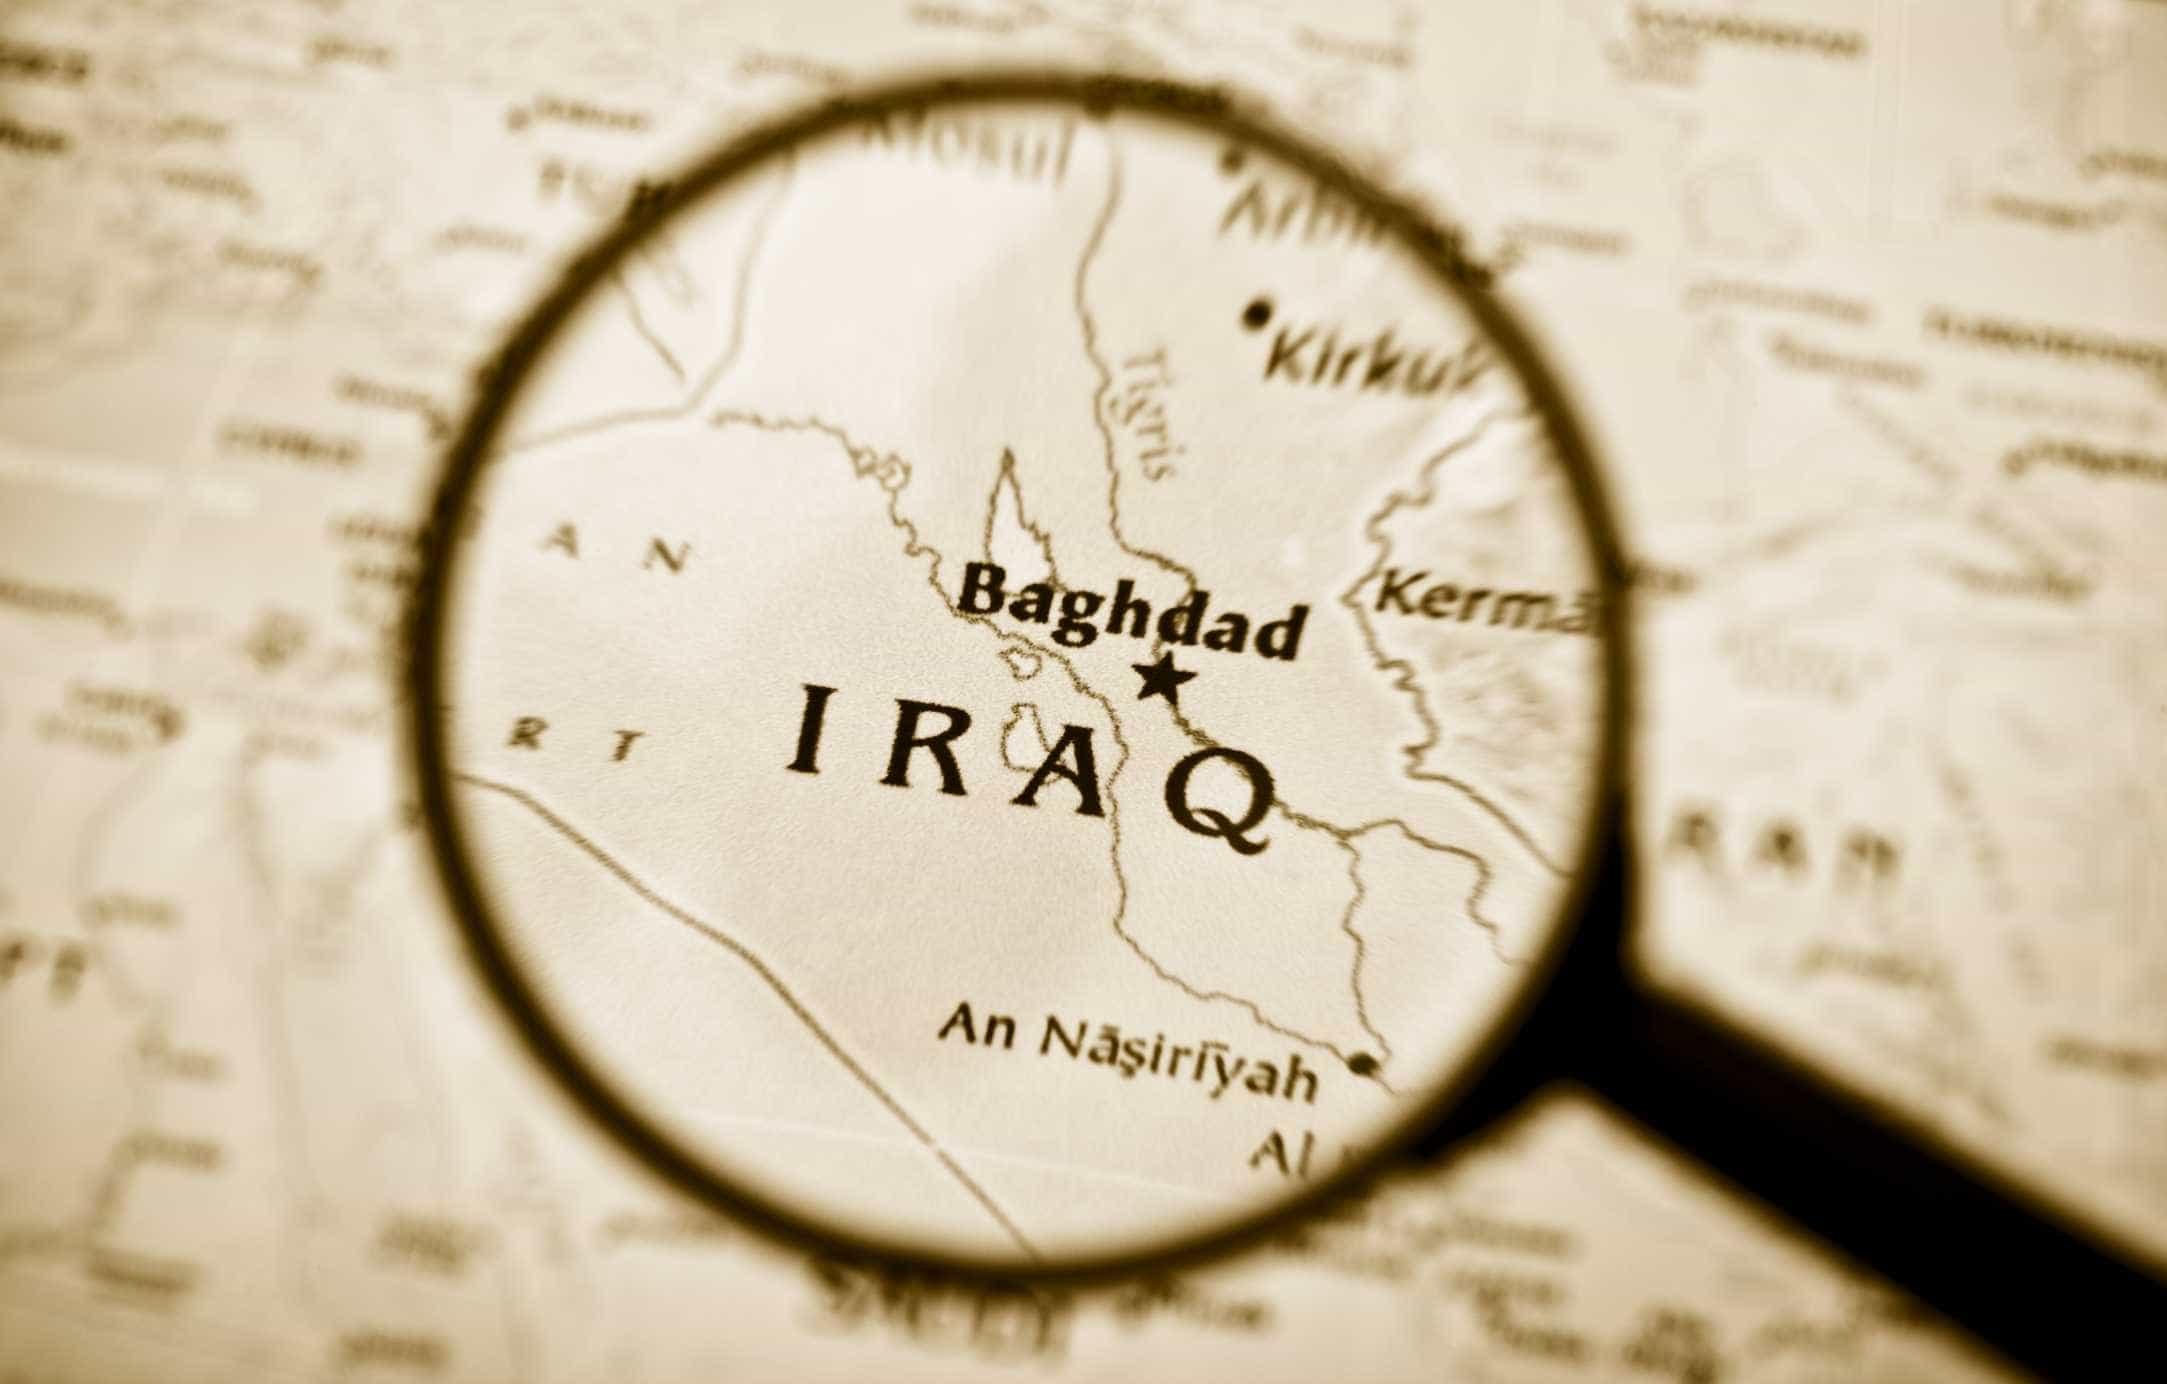 Disparado rocket sobre zona da embaixada dos Estados Unidos no Iraque